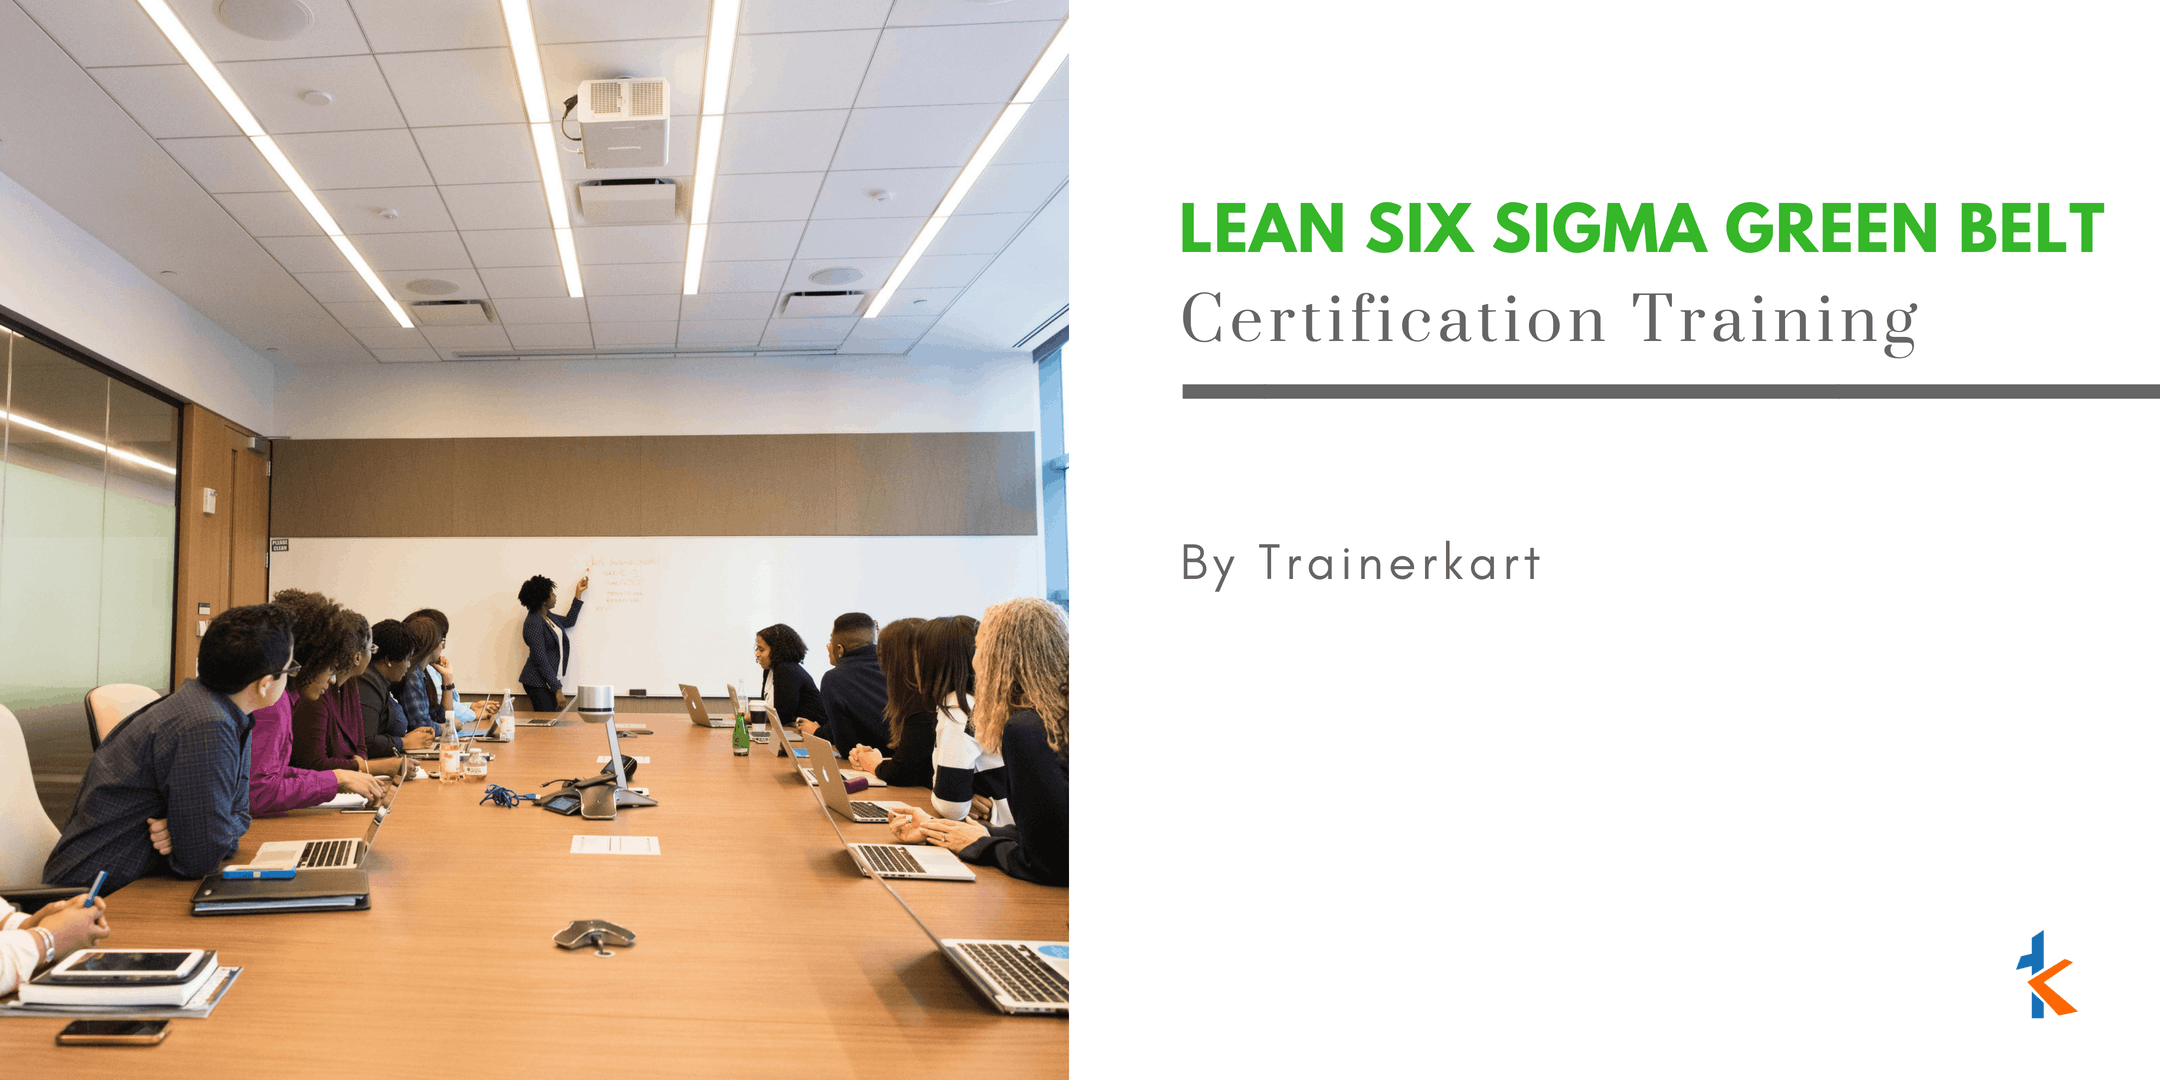 Lean Six Sigma Green Belt Training in Albany NY